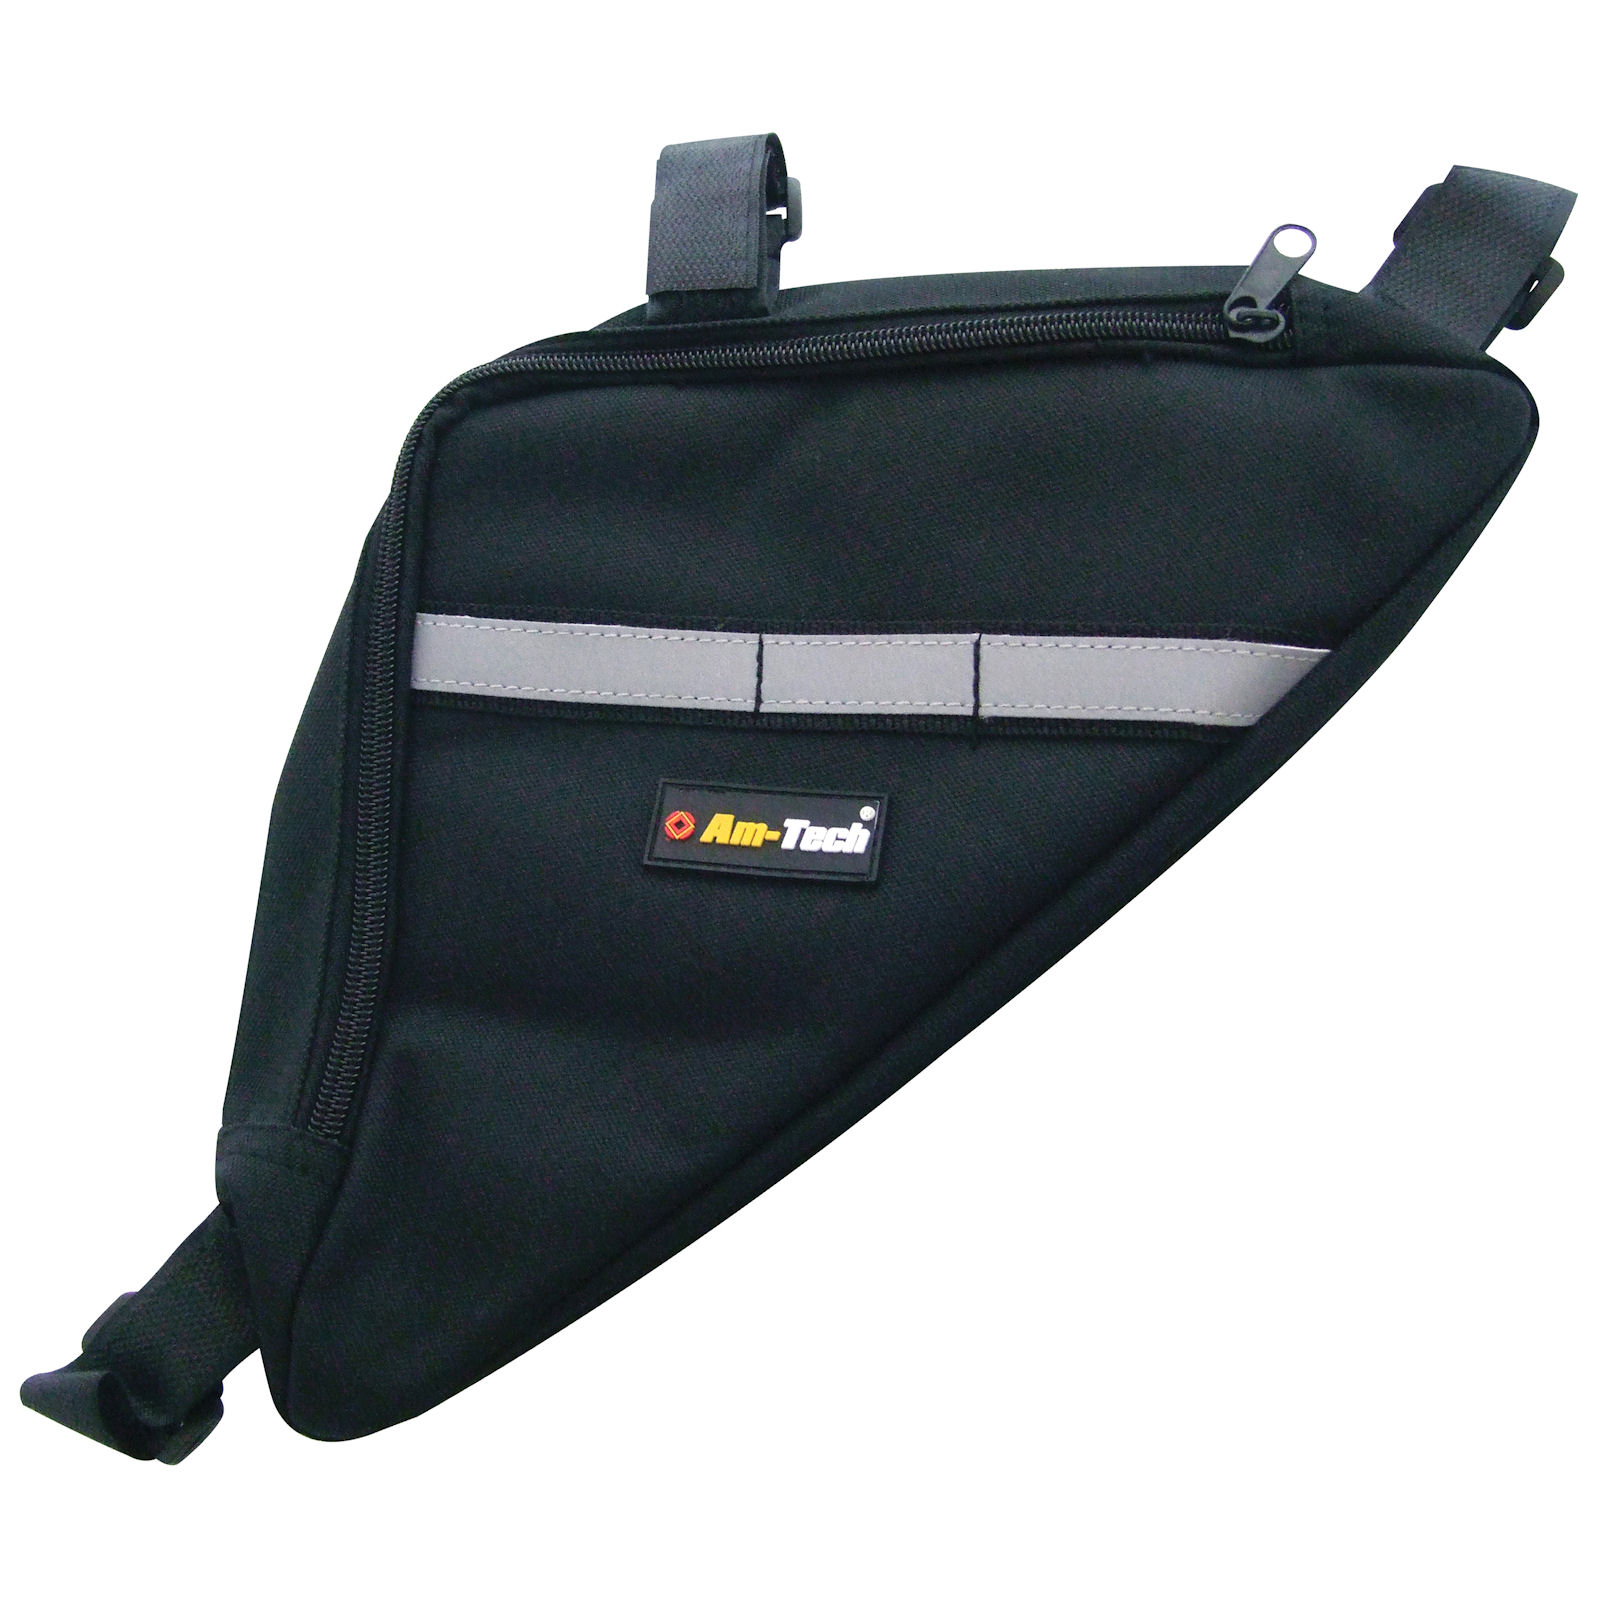 new am tech s1800 bicycle storage bag bike frame pouch